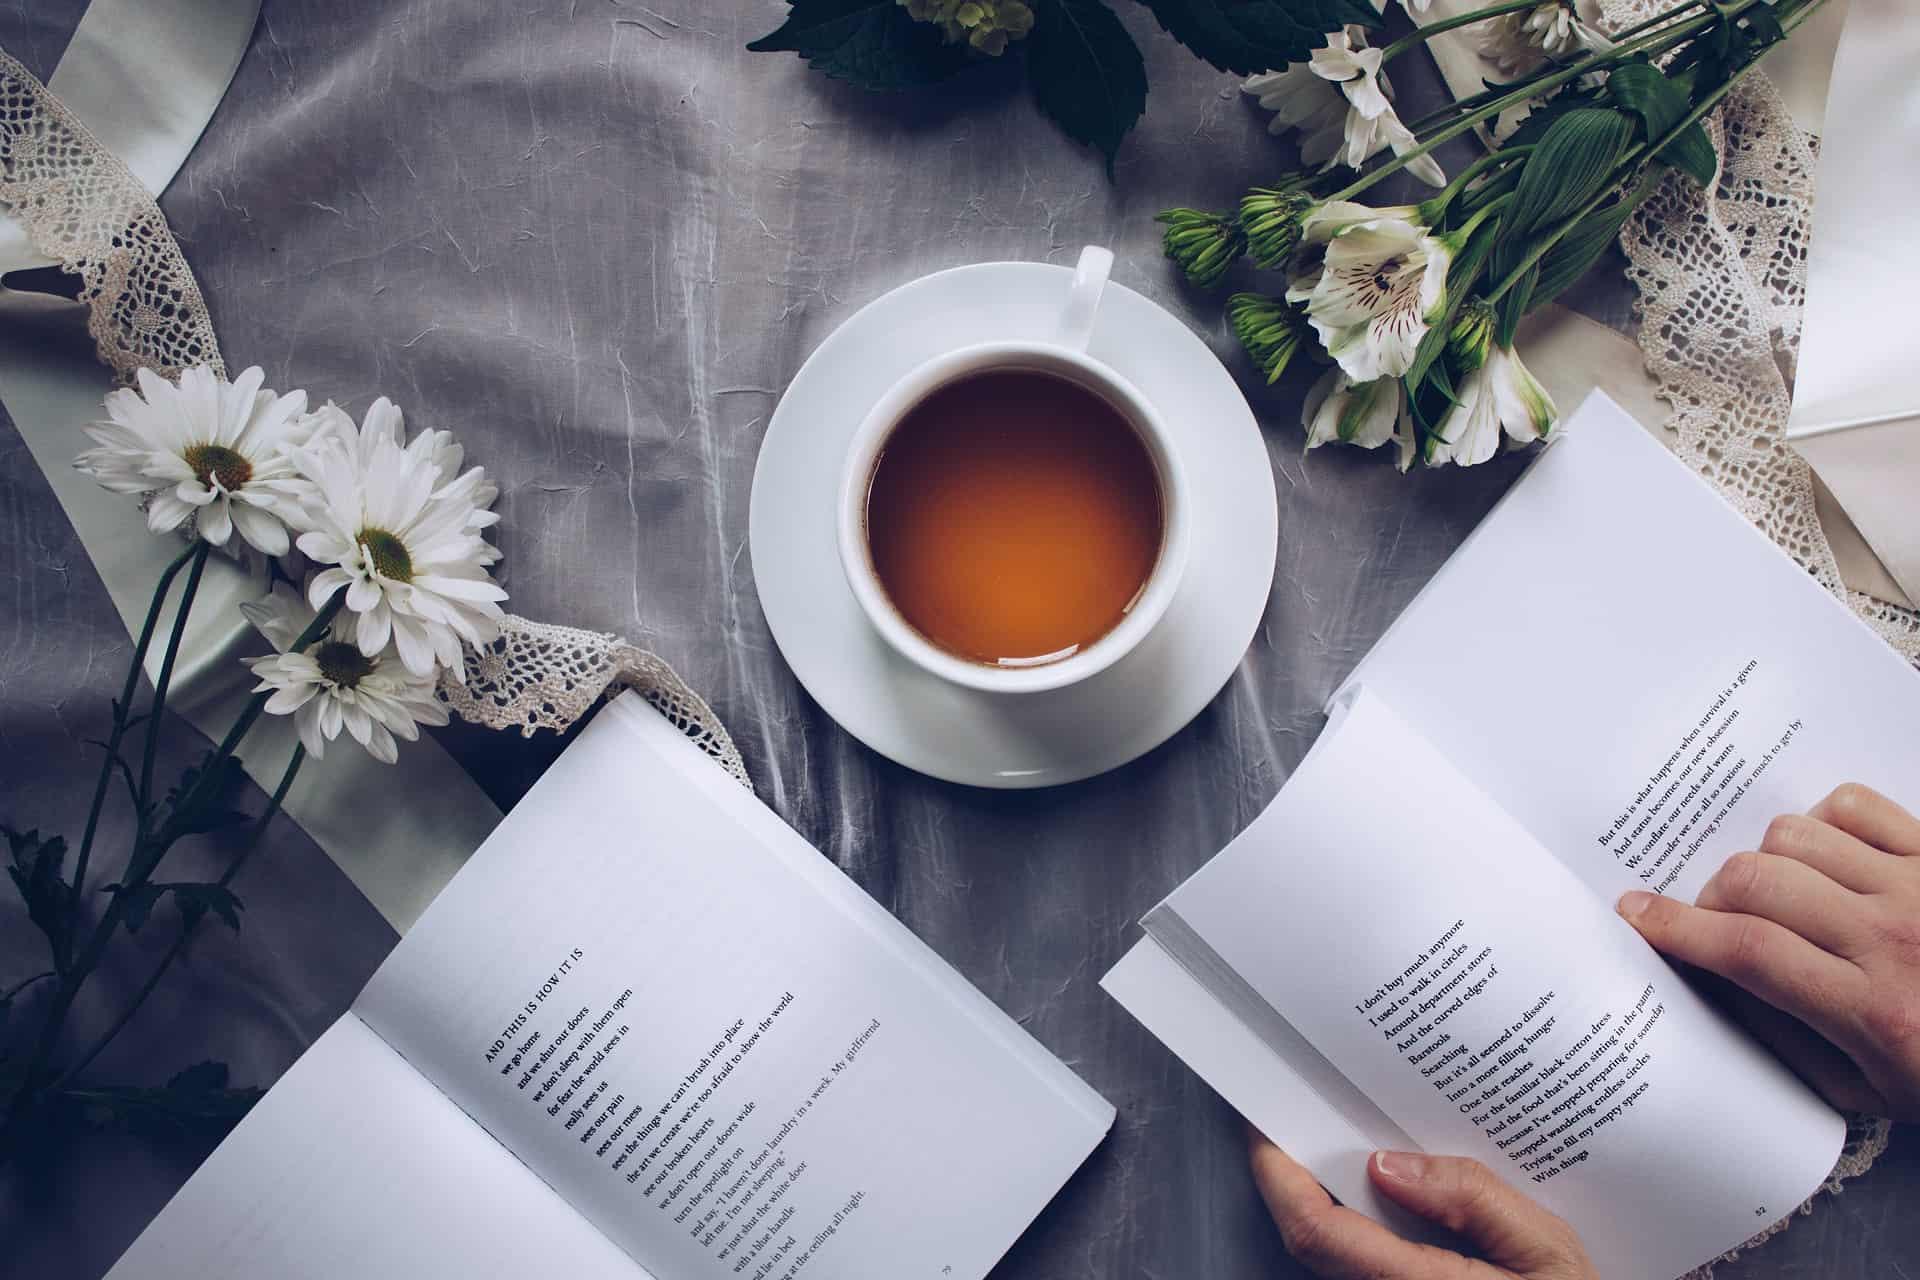 libri-da-leggere-assolutamente-in-autunno